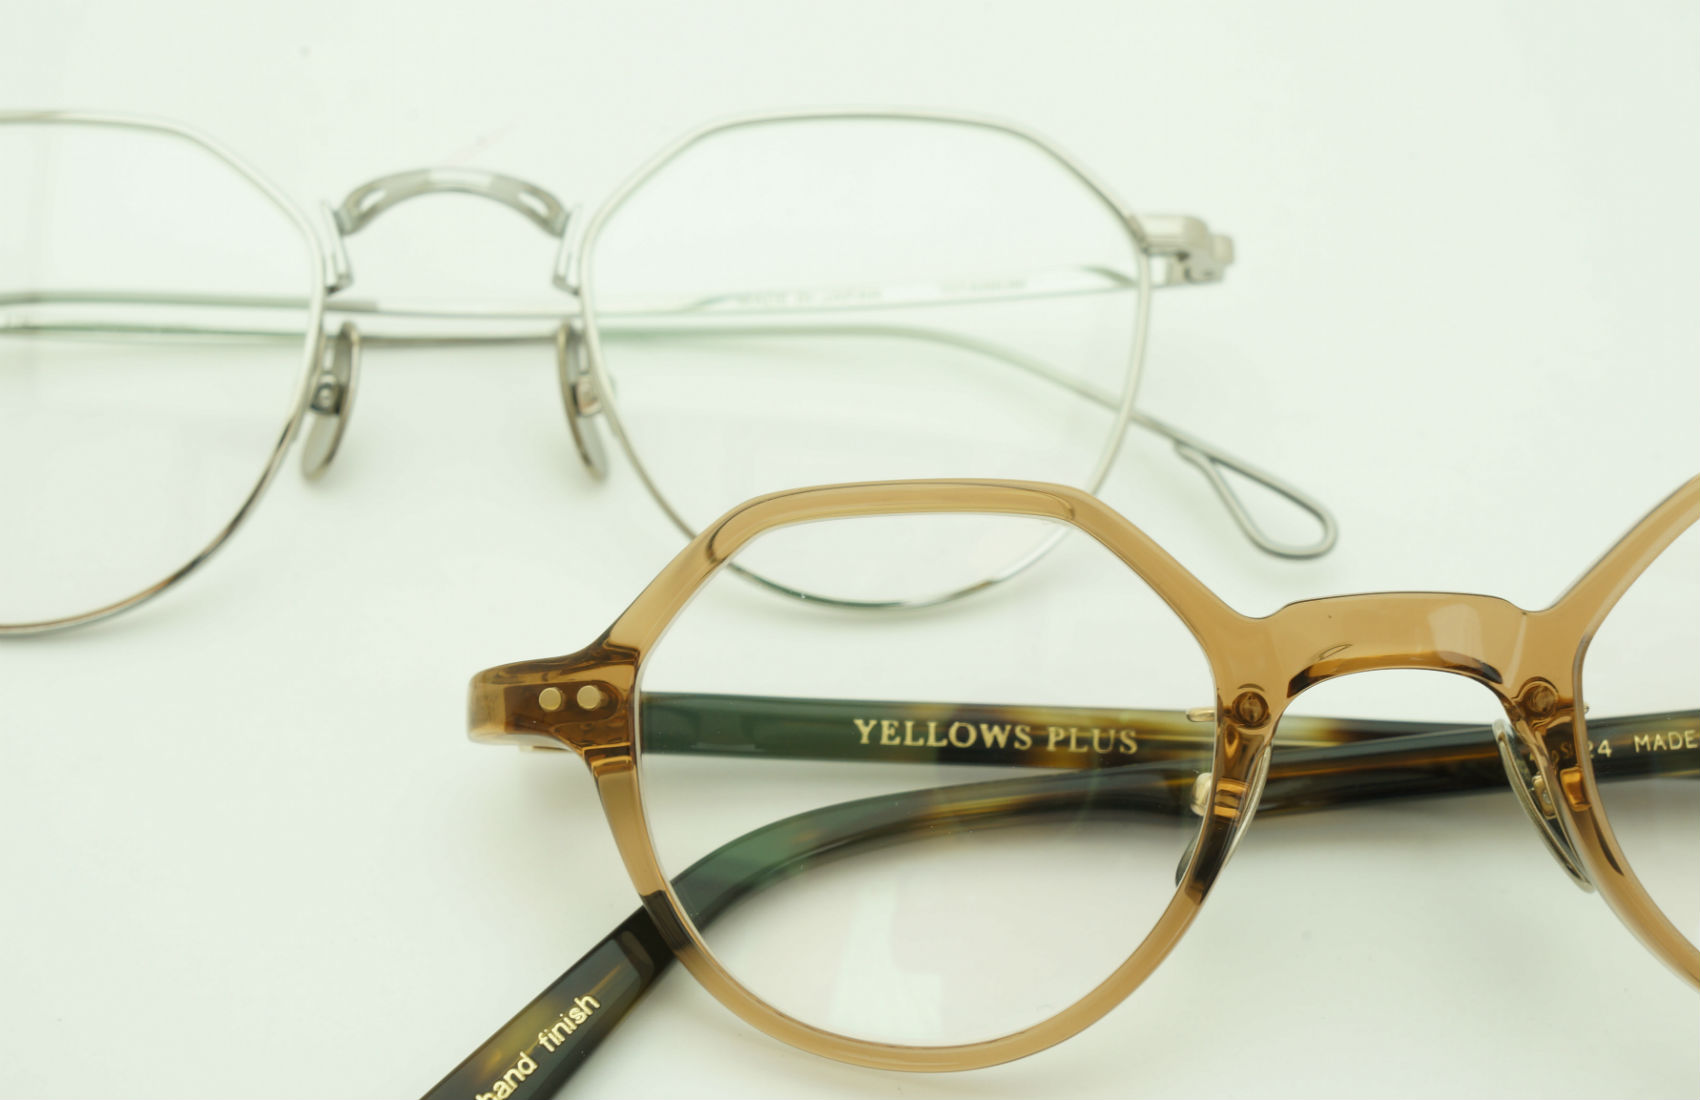 Yellows Plus DARCY WALTON